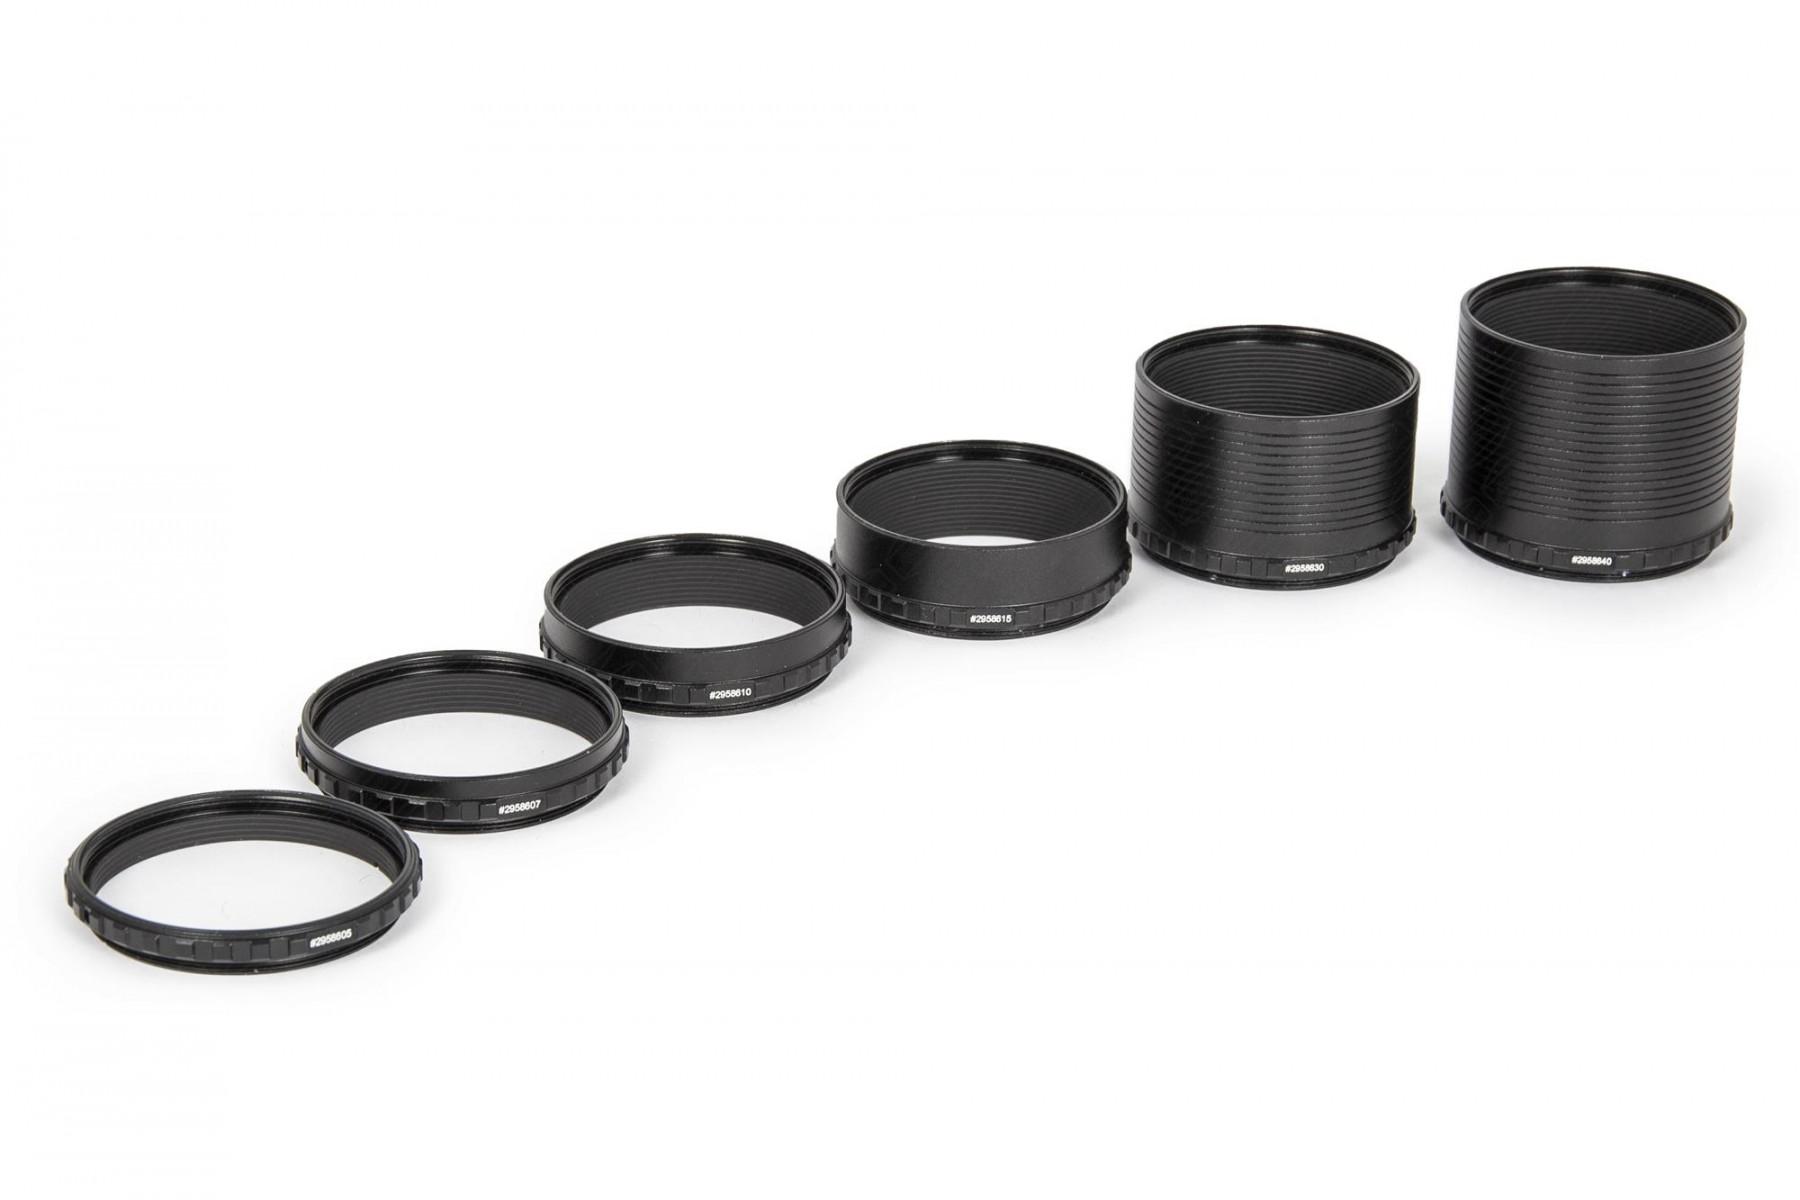 M48 Adjustment rings (5 mm, 7,5 mm, 10 mm, 15 mm, 30mm, 40 mm)